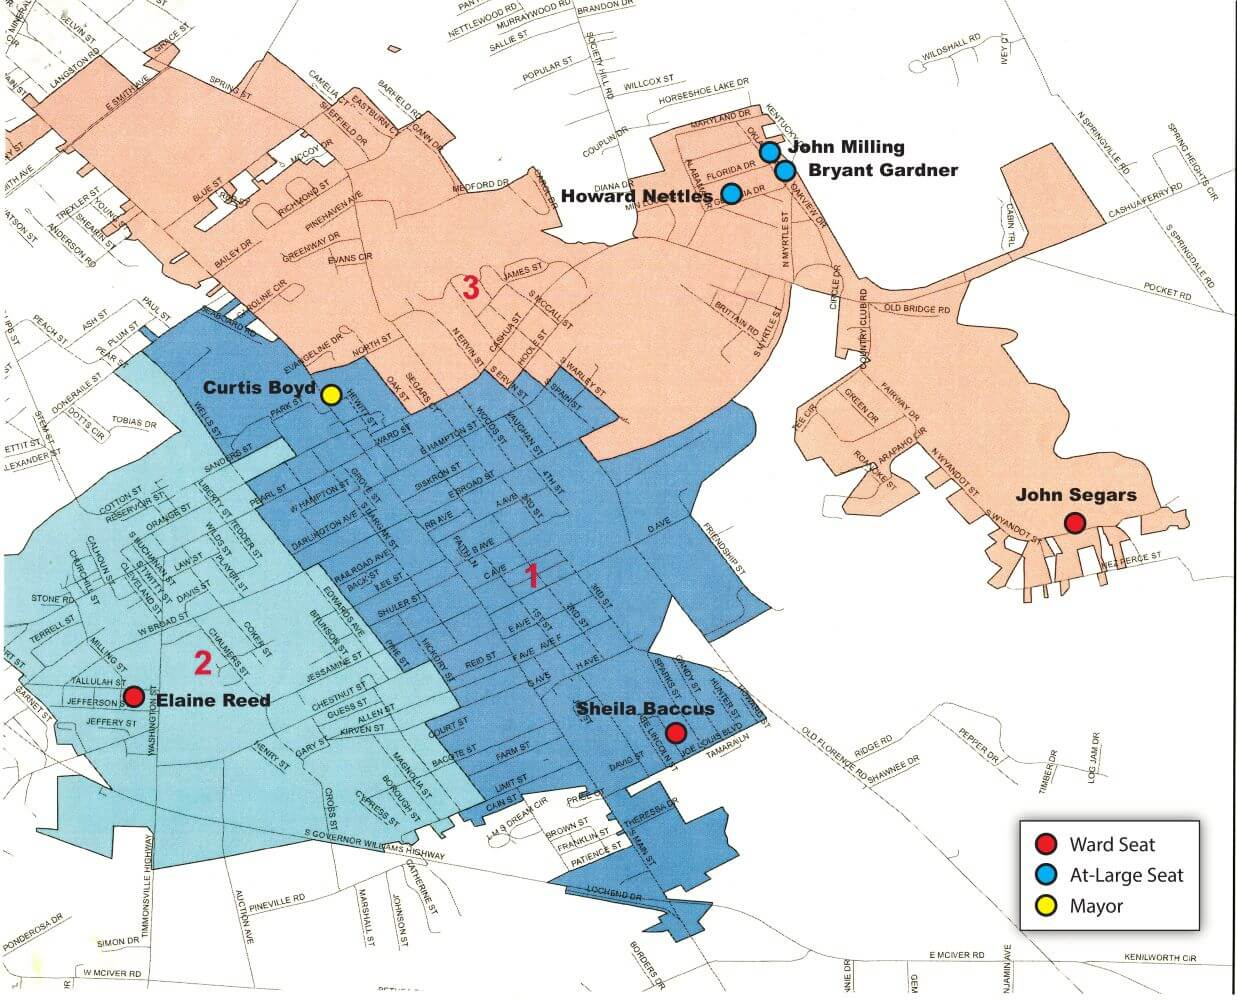 Mayor_Council_Wards Map